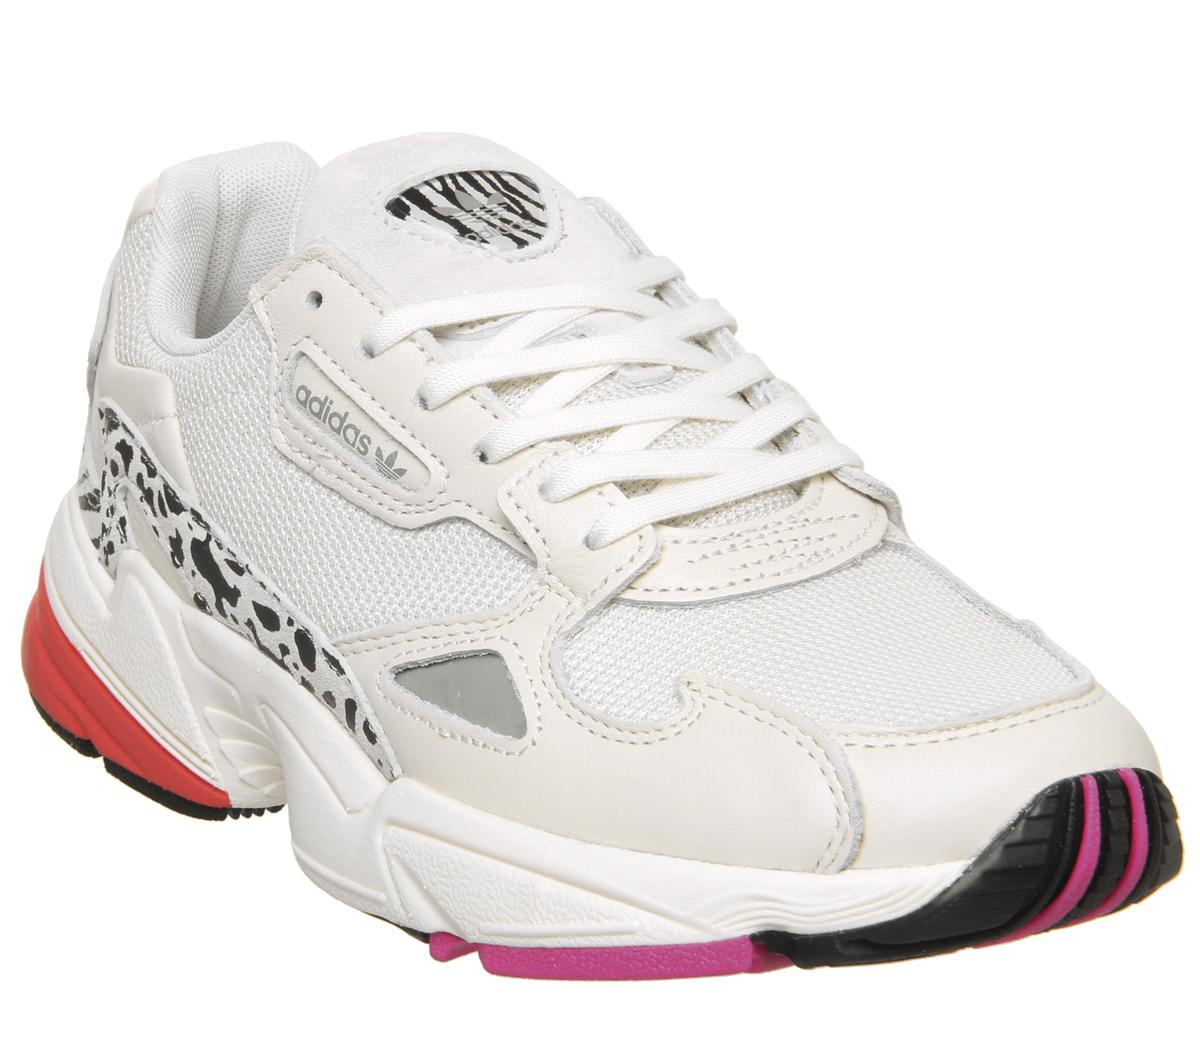 adidas Falcon Herren Sneaker Rot Schuhe, Größe:44